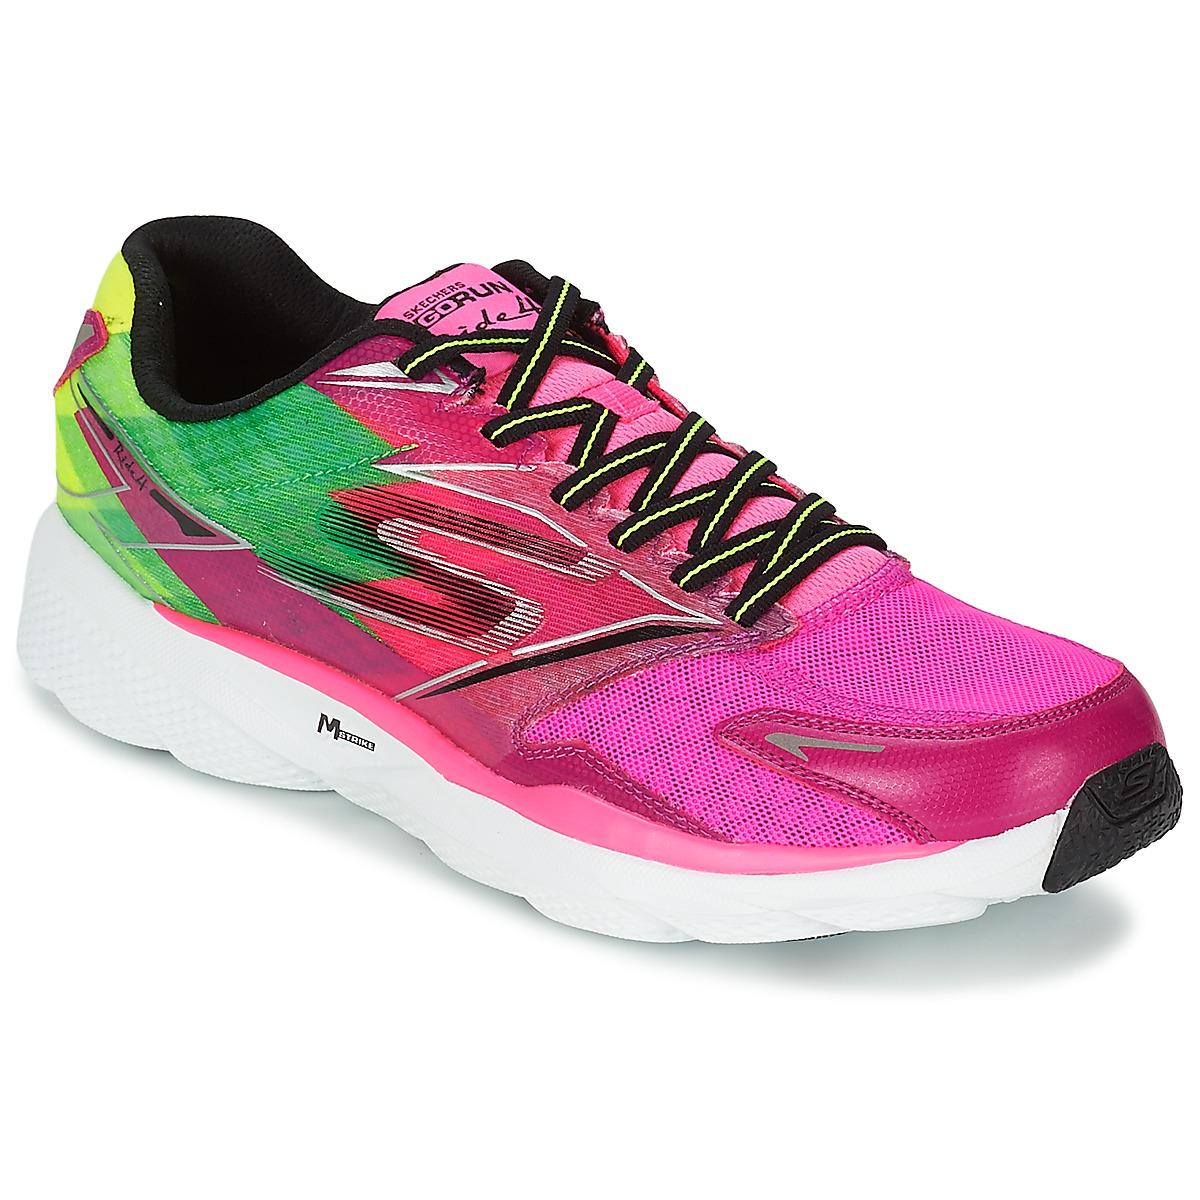 chaussures de running skechers go run ride 4 rose baskets femme skechers spartoo ventes pas. Black Bedroom Furniture Sets. Home Design Ideas